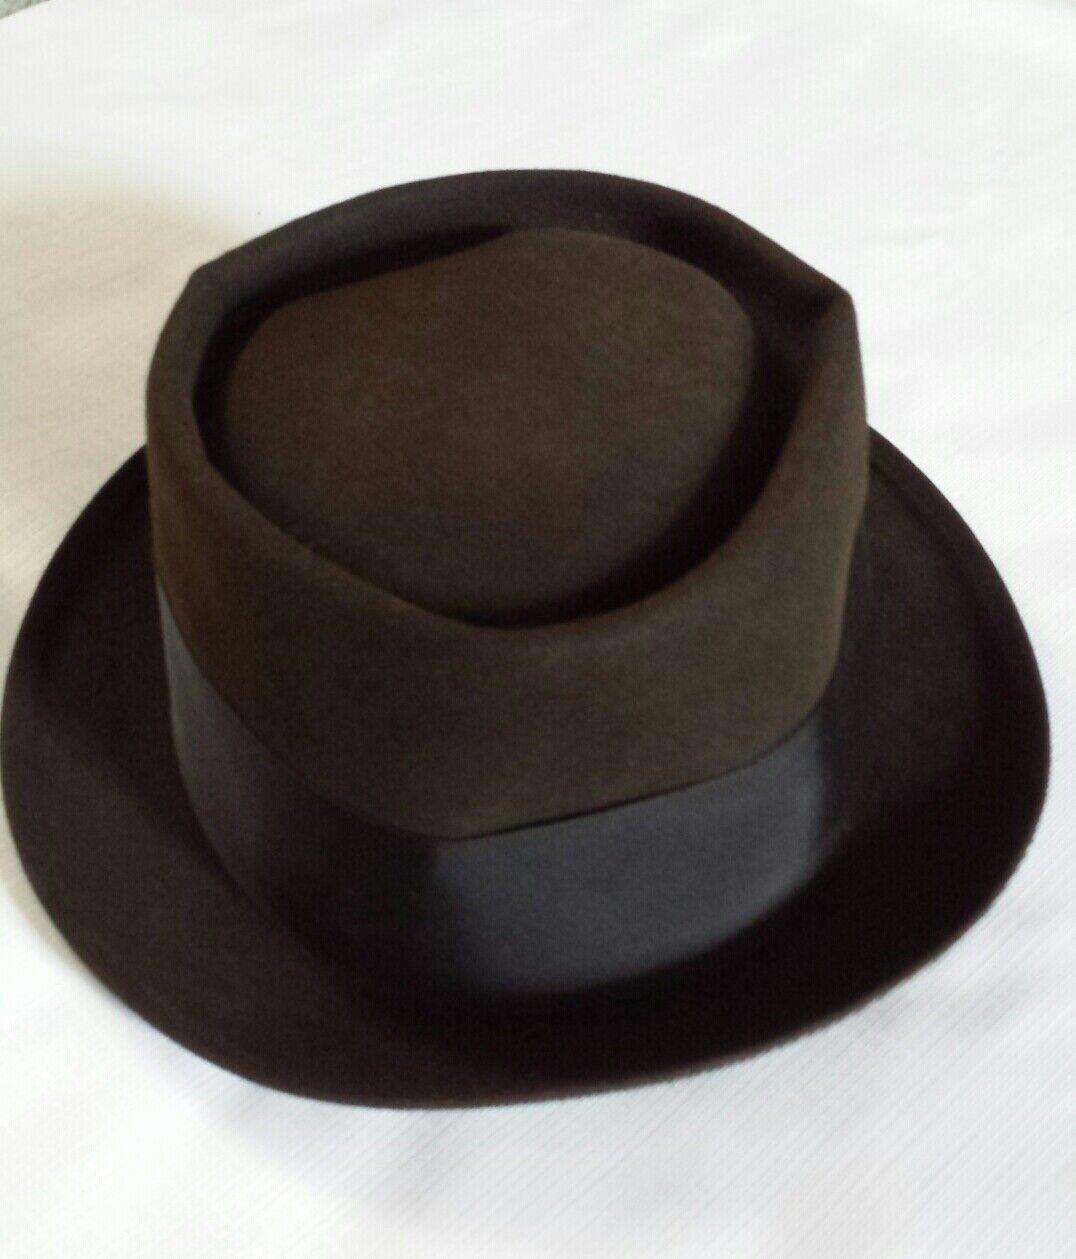 Vintage Mallory Pork Pie Style Felt Hat Size 7 1/8 - image 2